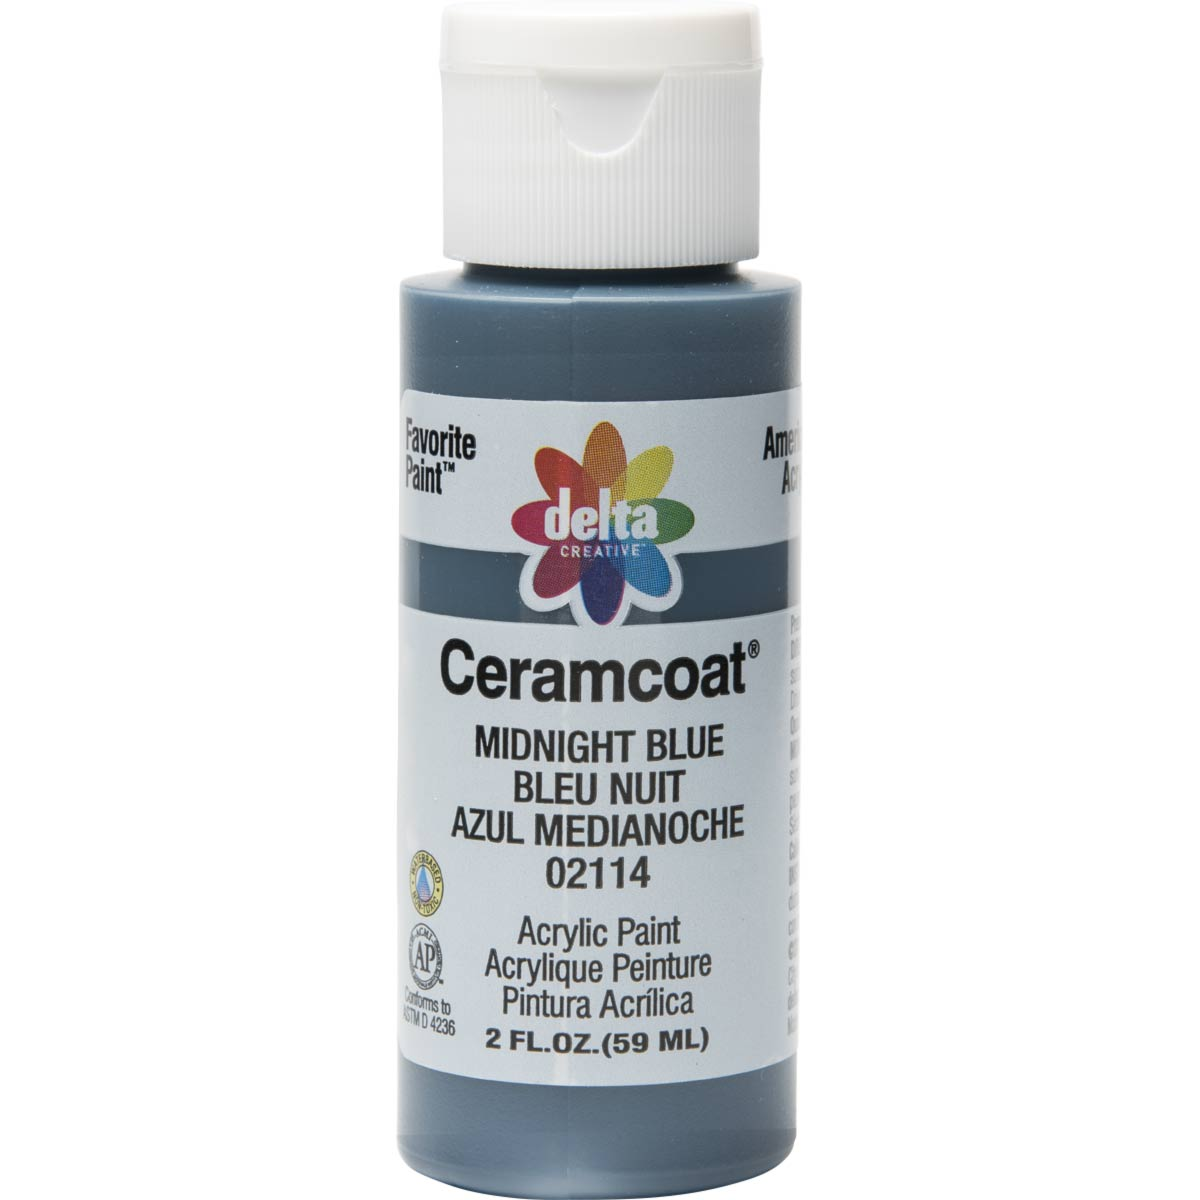 Delta Ceramcoat Acrylic Paint - Midnight Blue, 2 oz. - 021140202W